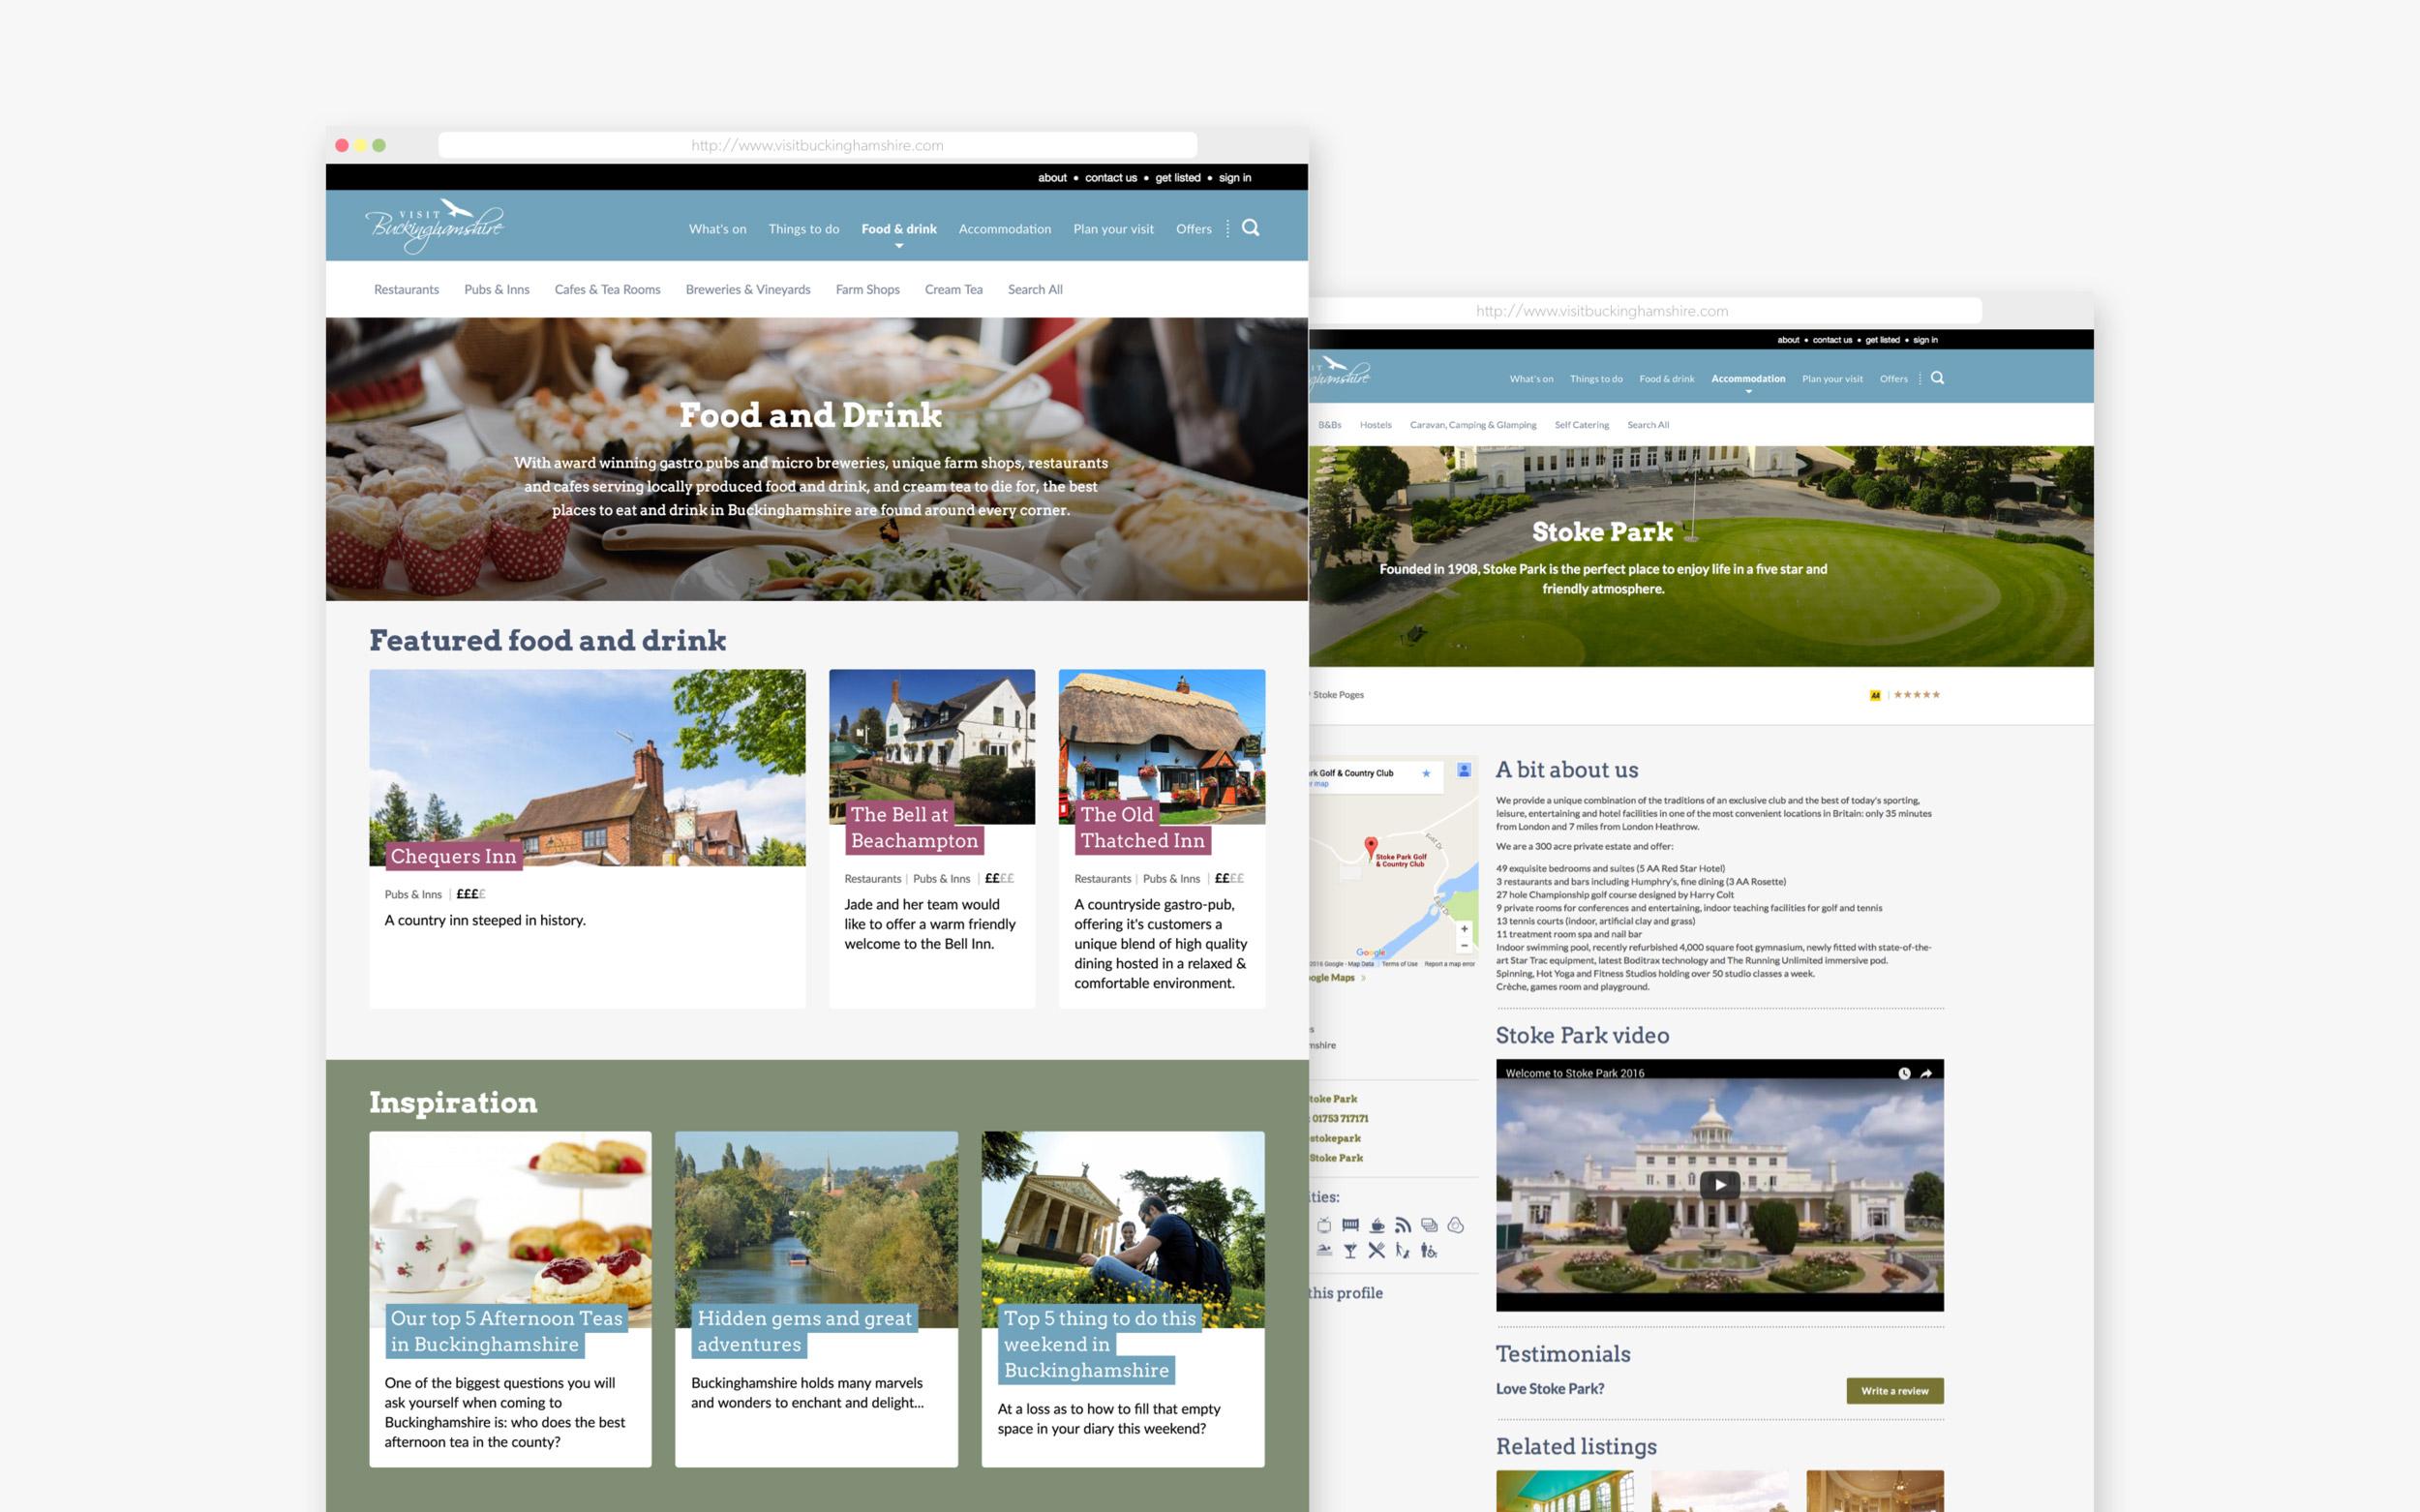 Visit-buckinghamshire-website-food-drink-furthermore